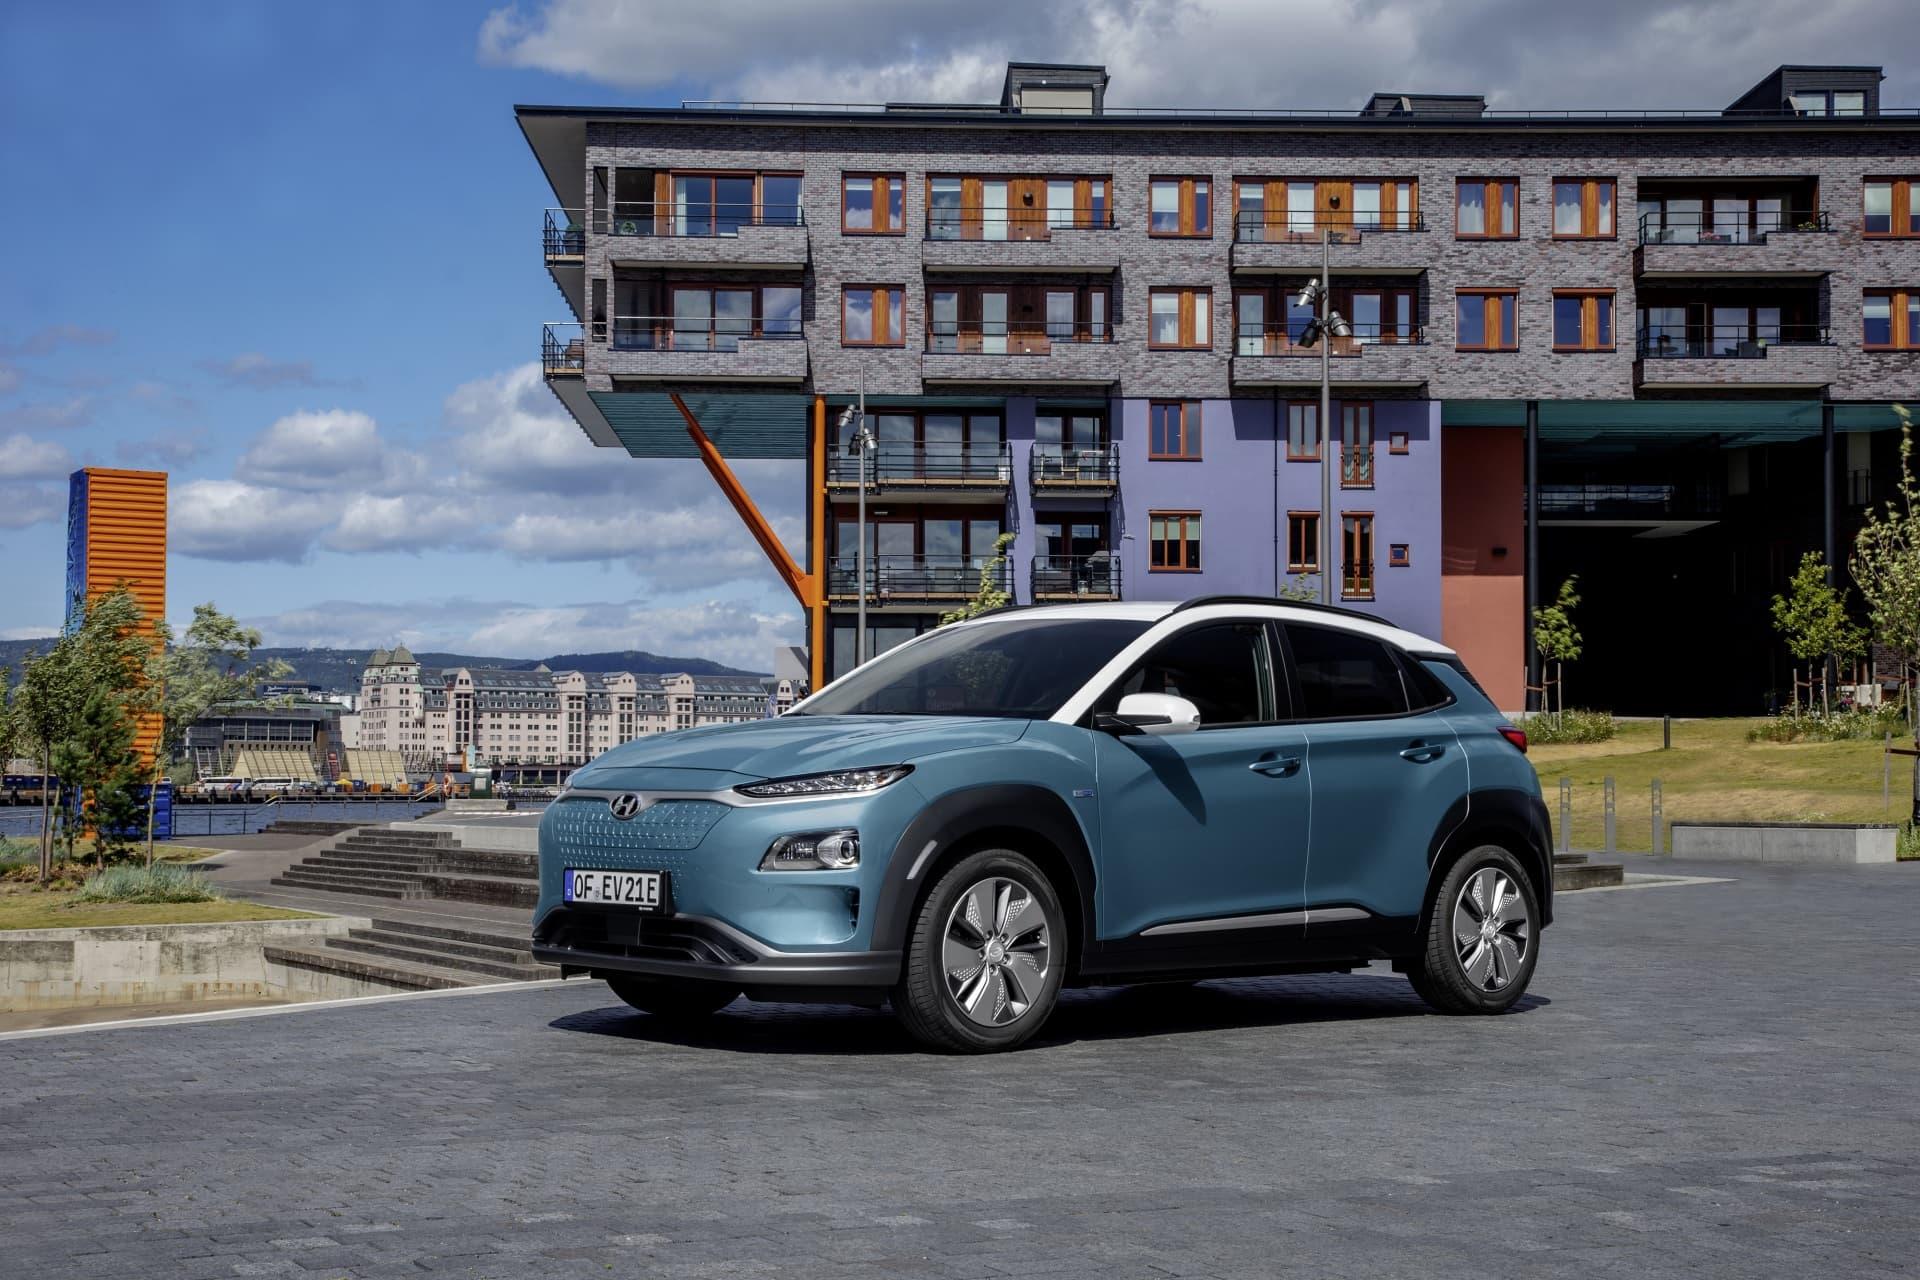 Oferta Hyundai Kona Ev Electrico Agosto 2020 01